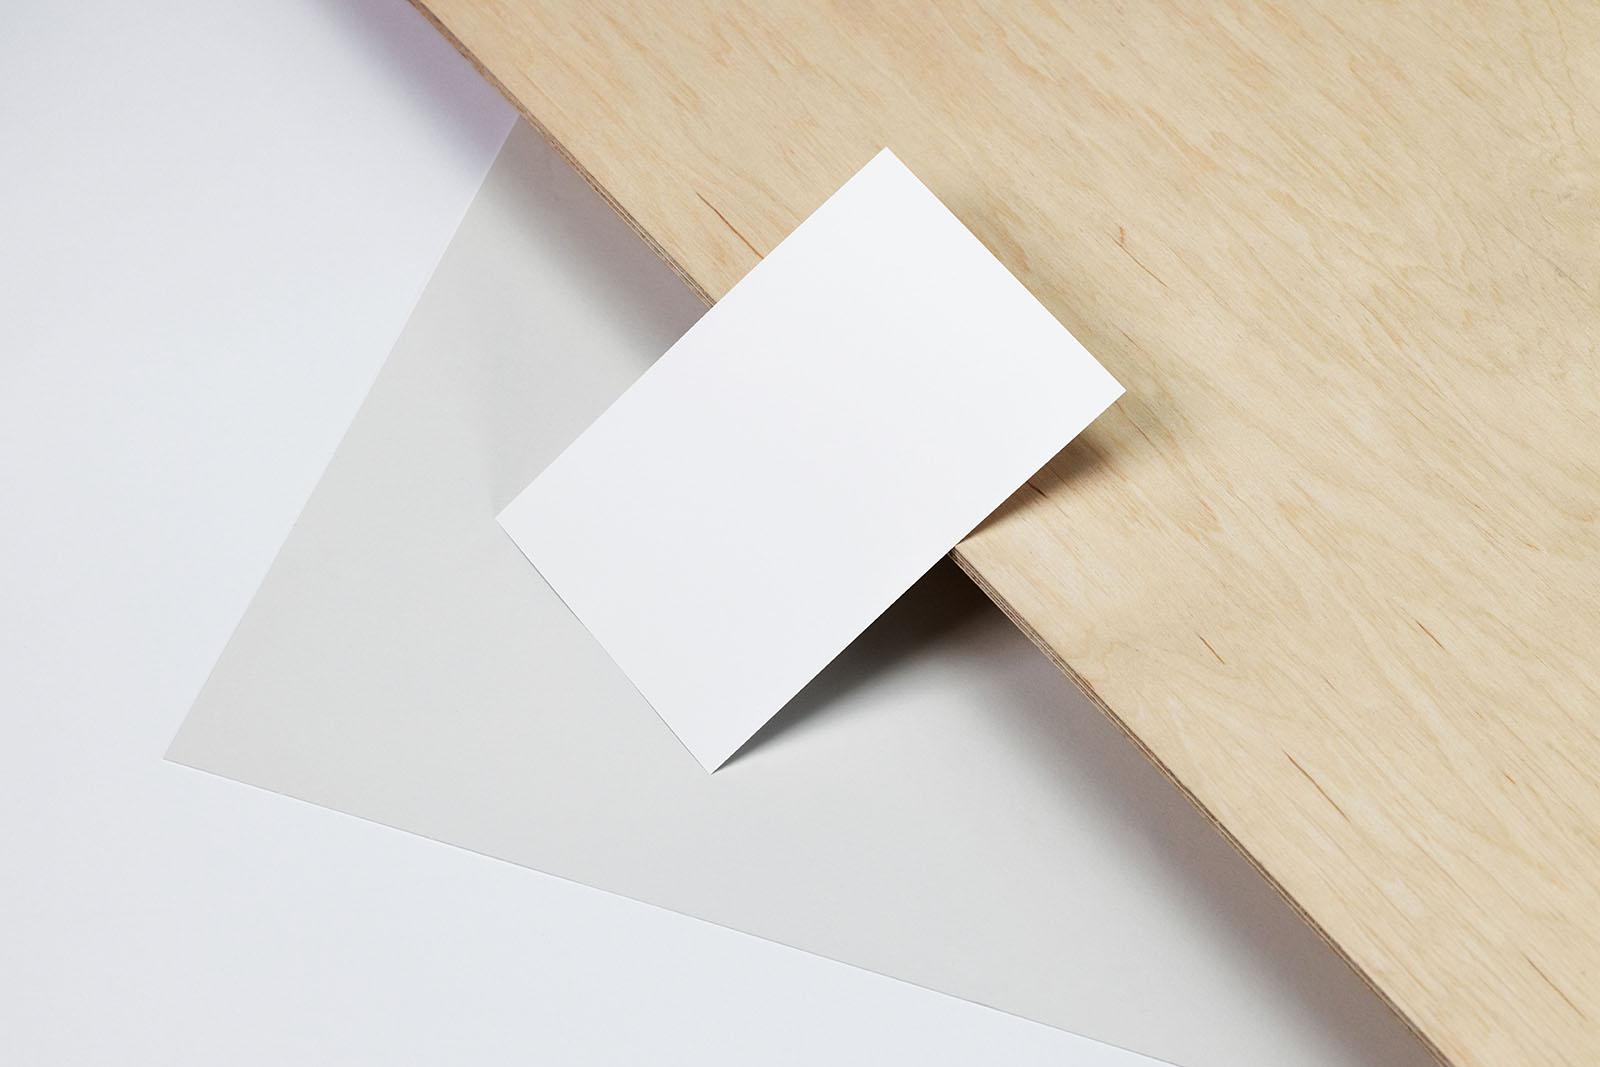 Simple A6 flyer mockup